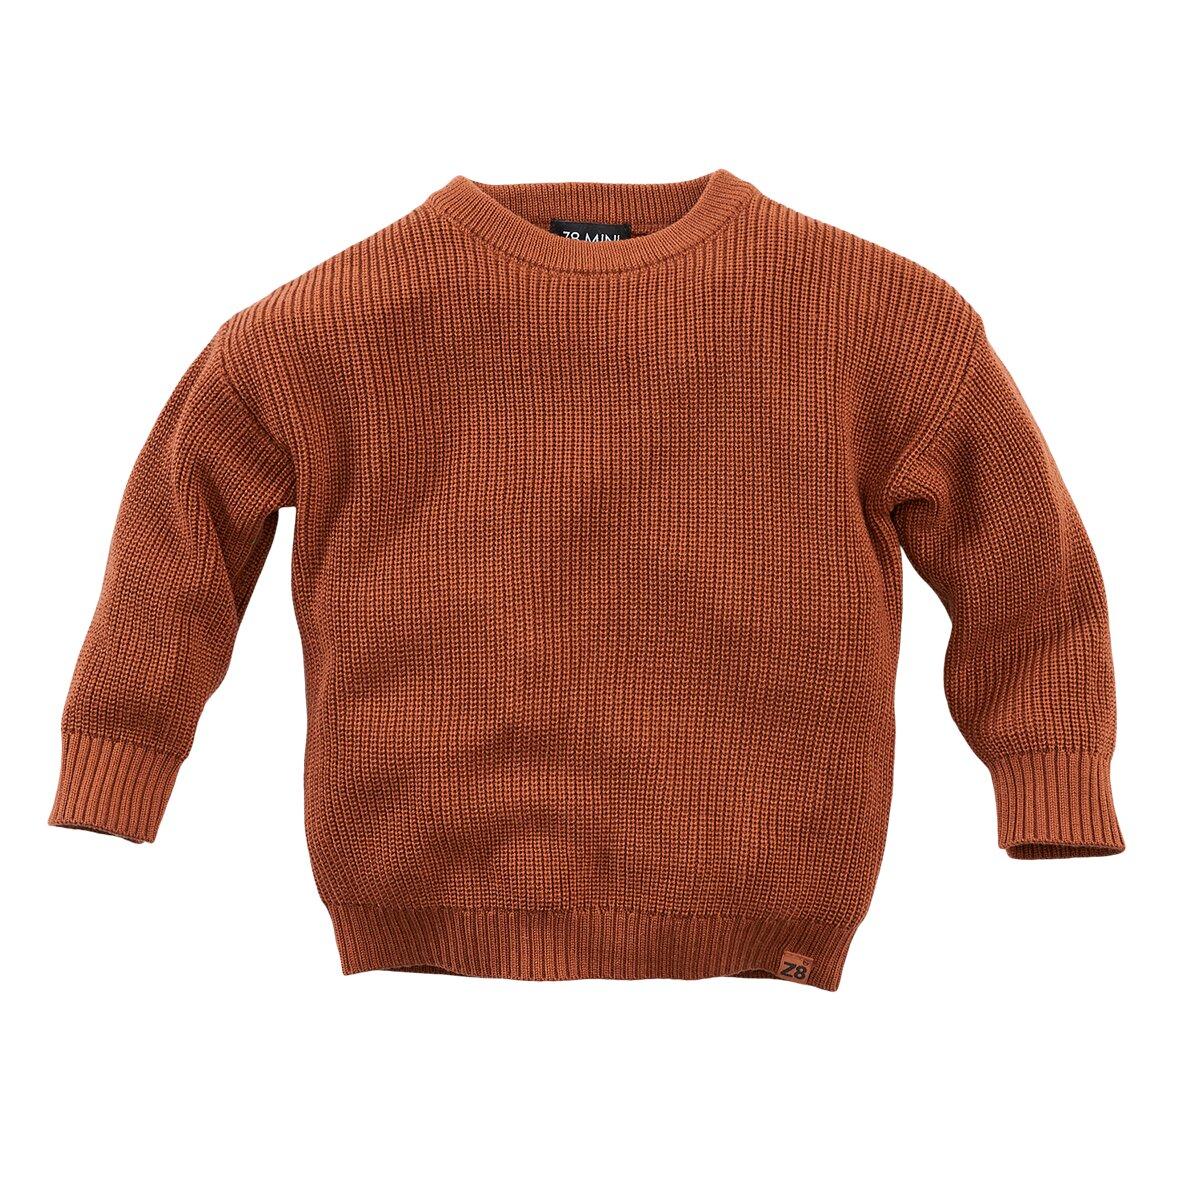 z8-mini-limited-product0006savory-copper-blush